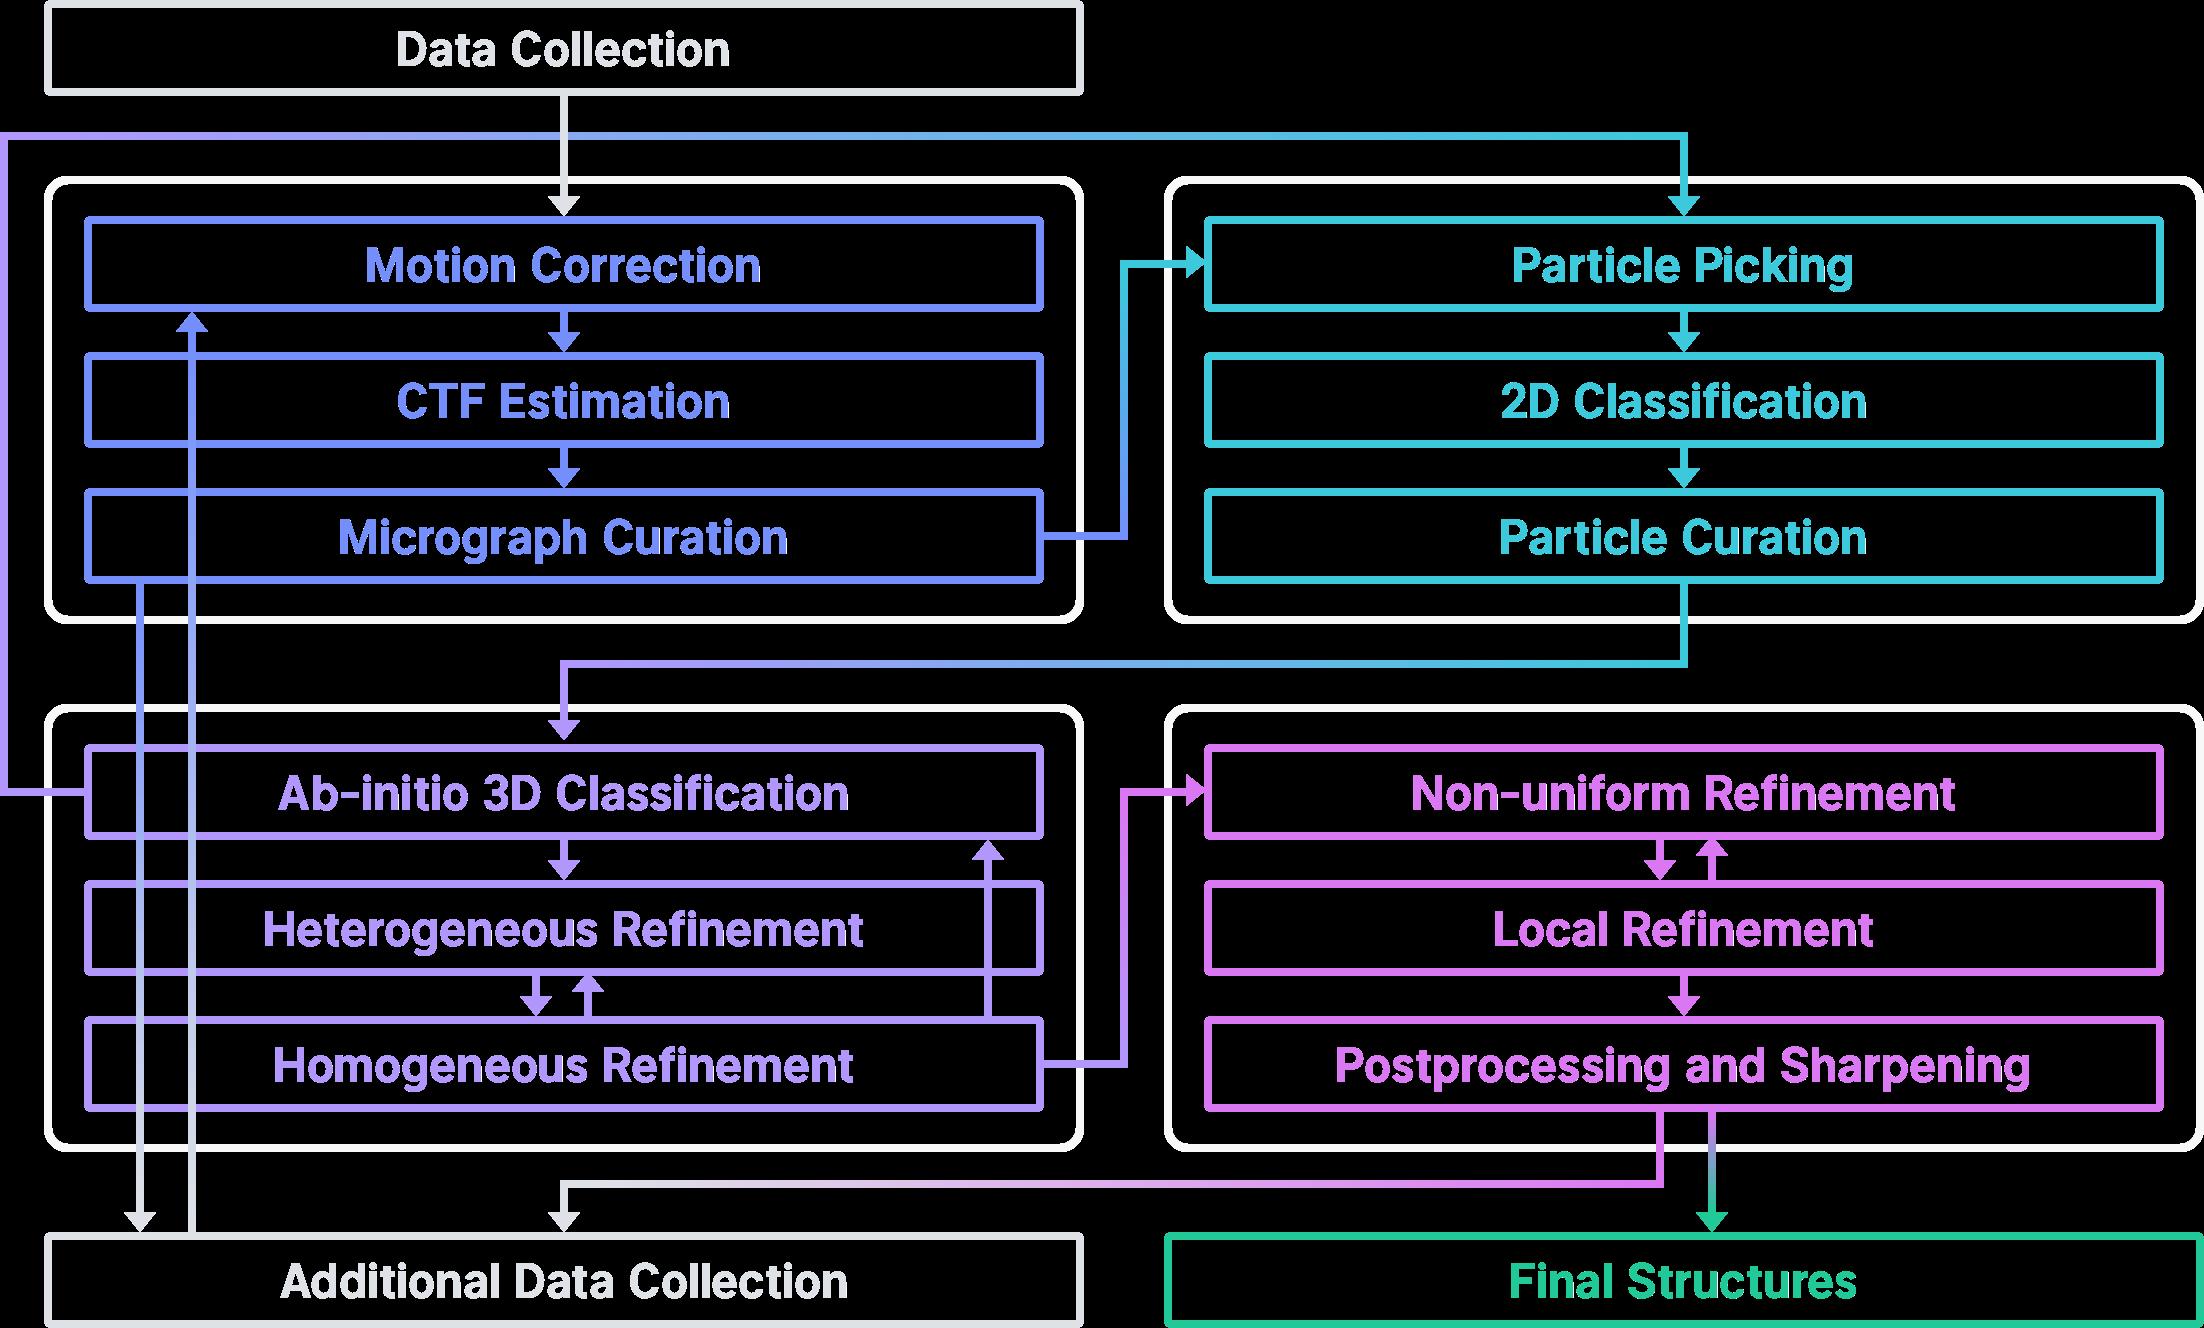 CryoSPARC Processing Pipeline